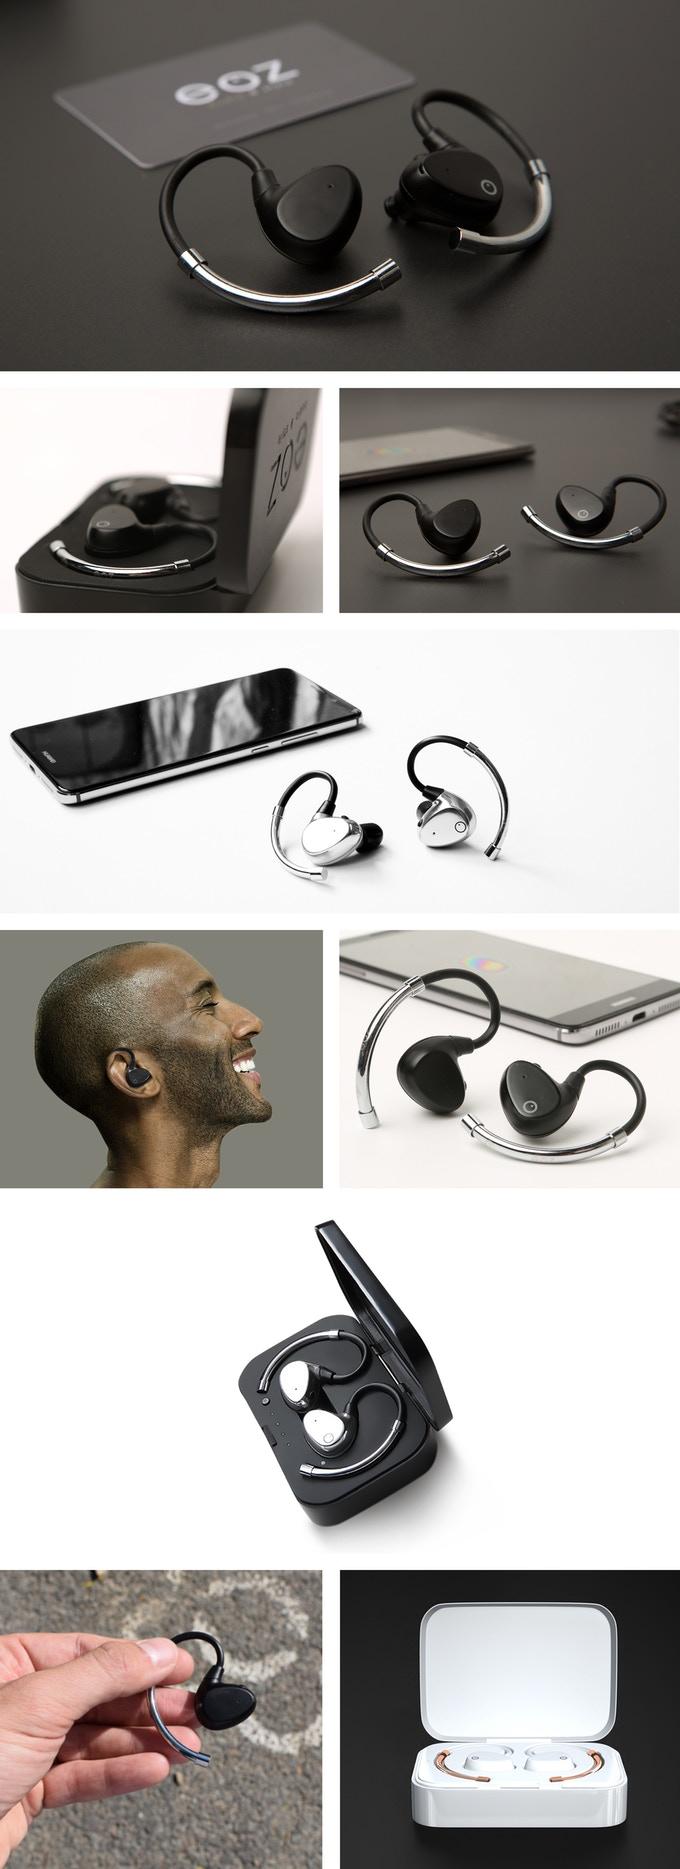 Eoz Air Worlds Most Advanced Wireless Earphones Indiegogo